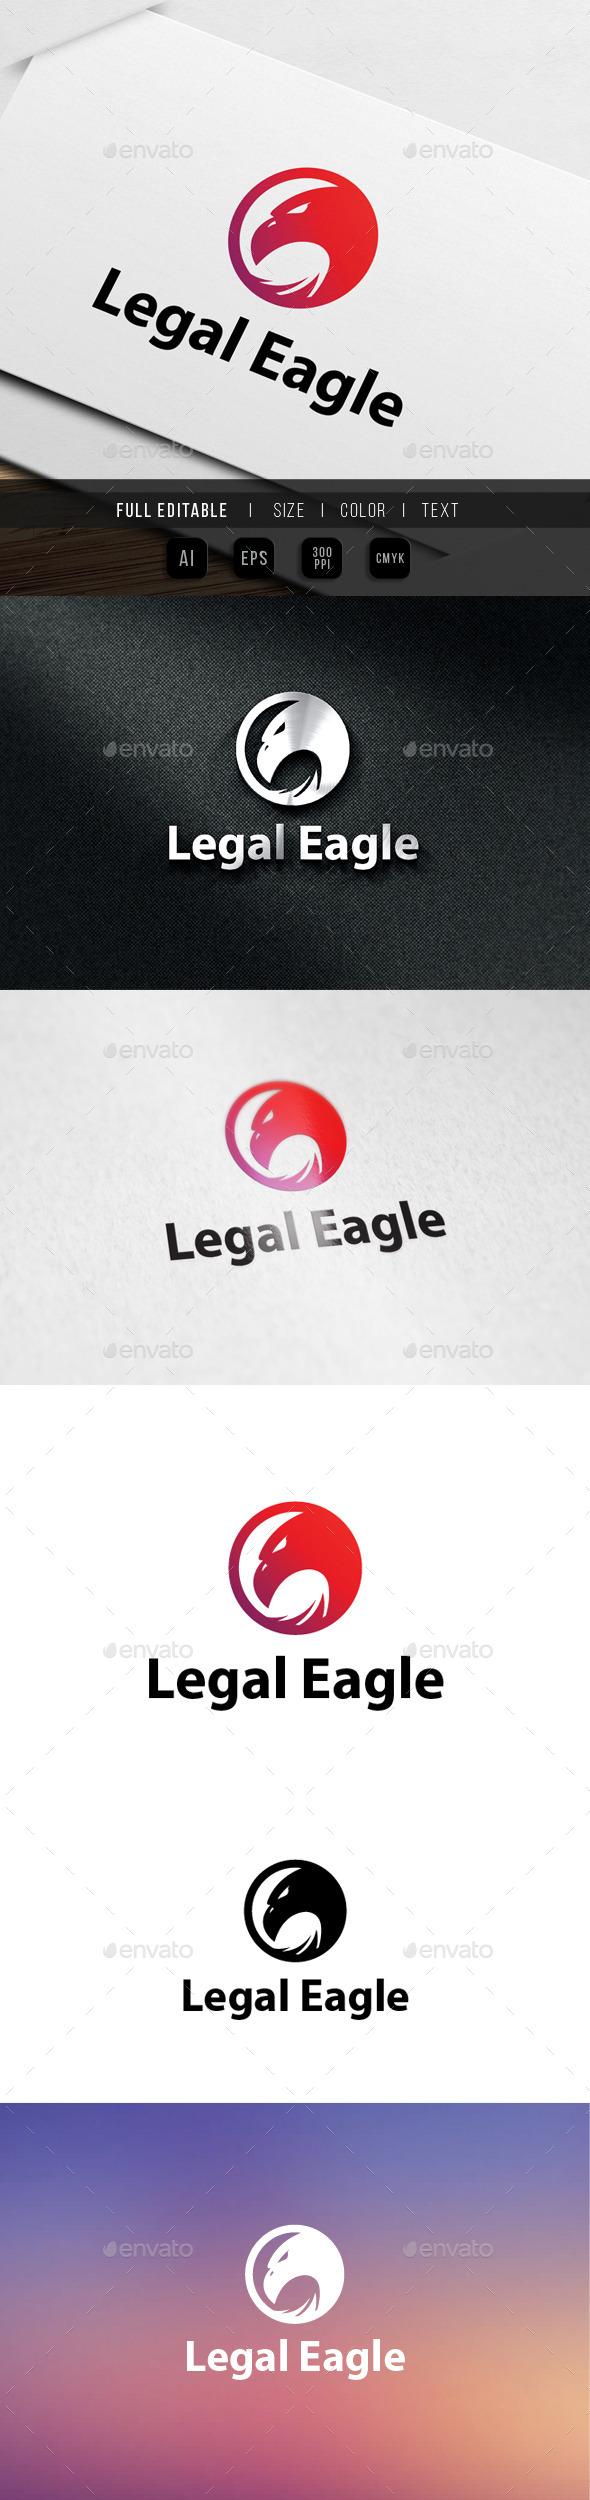 GraphicRiver Legal Eagle Logo 9826492